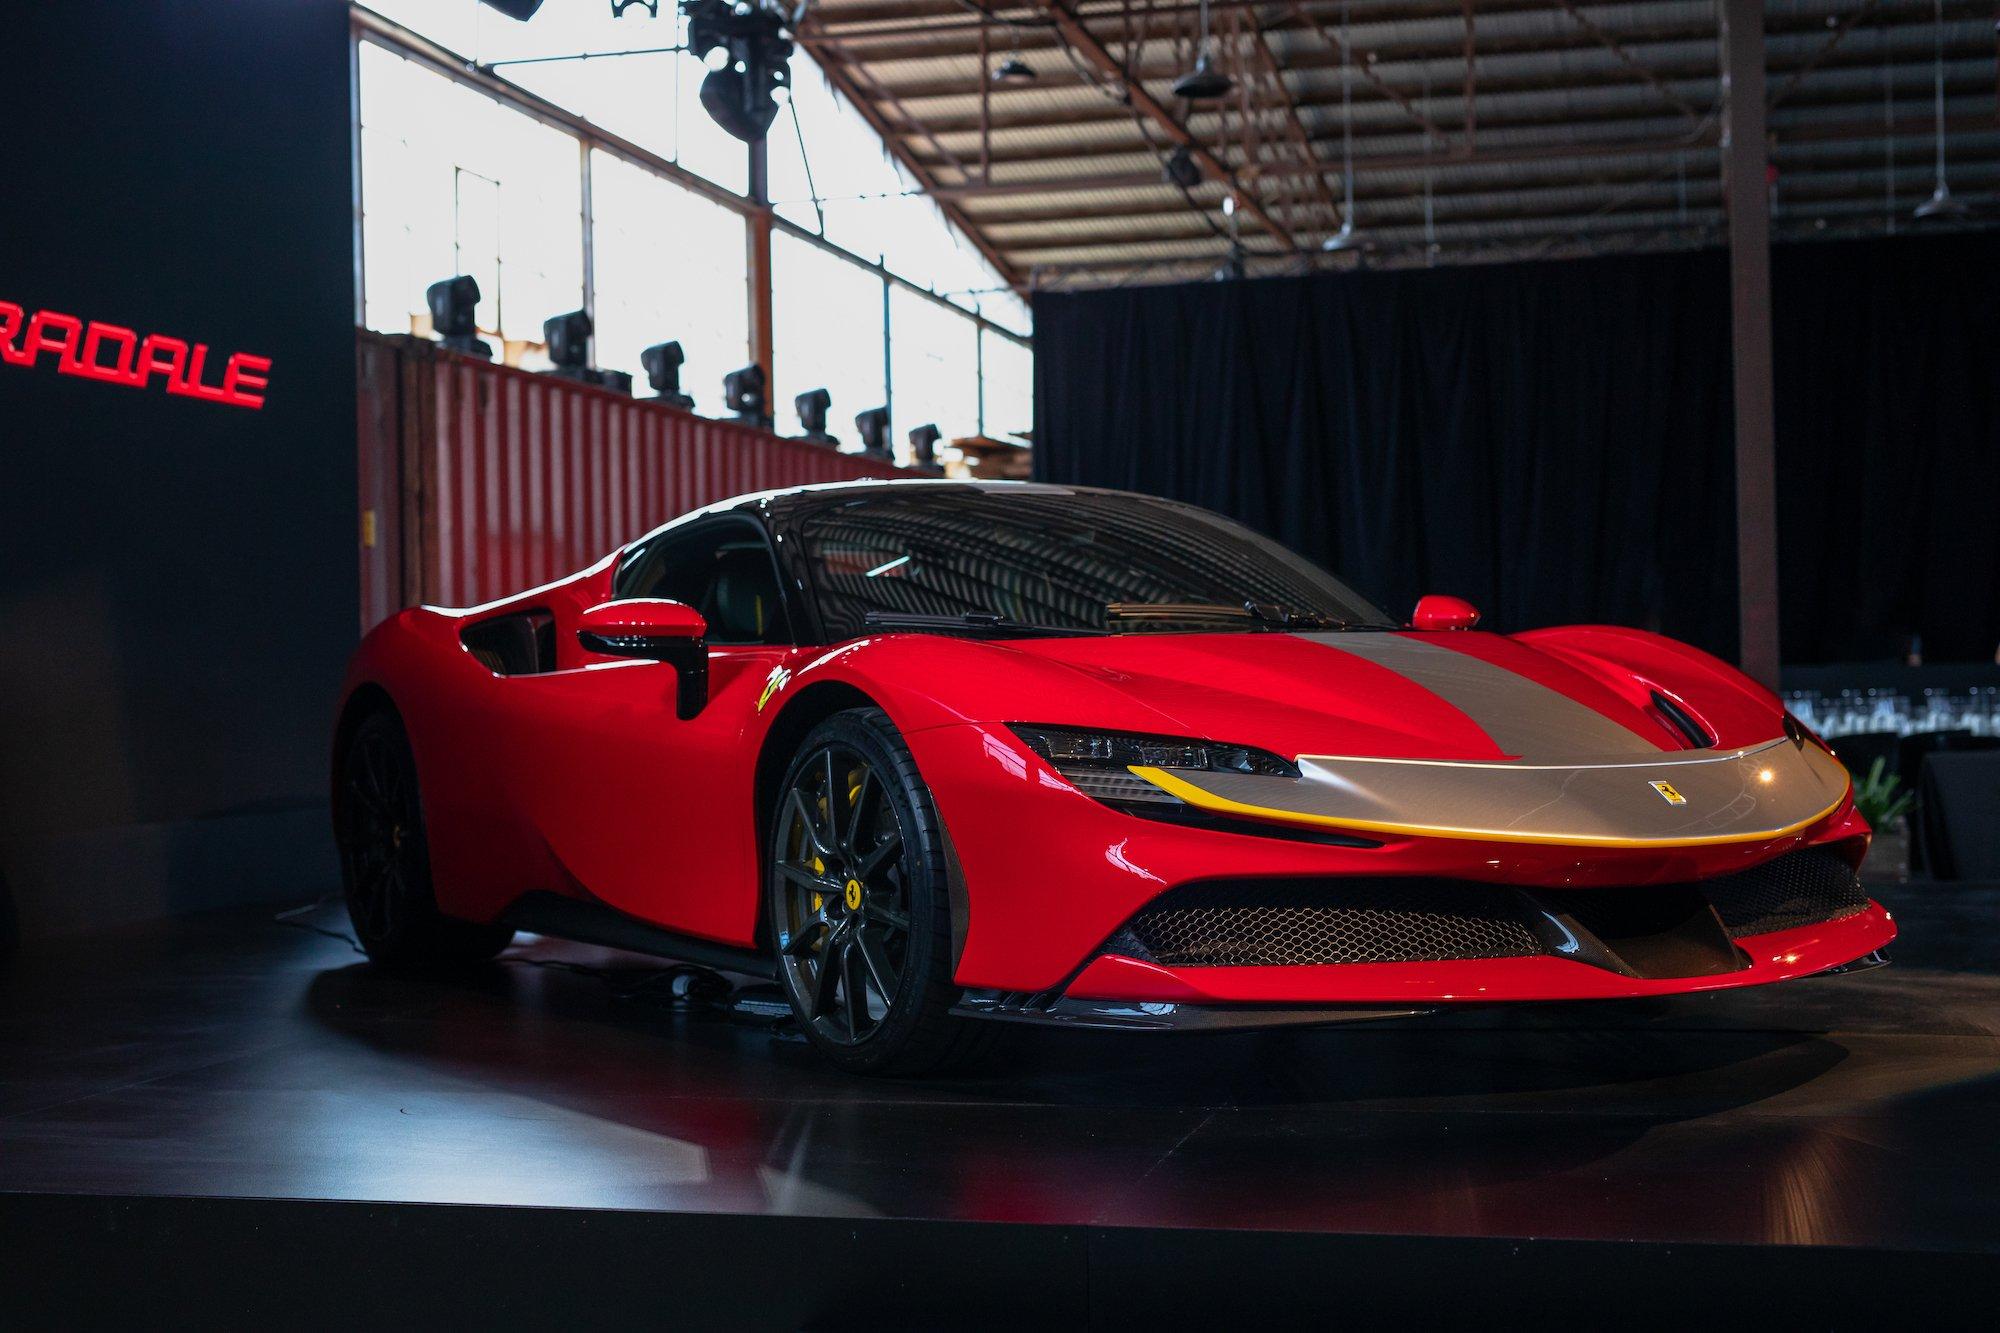 Ferrari S Sf90 Stradale Lands In Australia With A 1 Million Price Tag